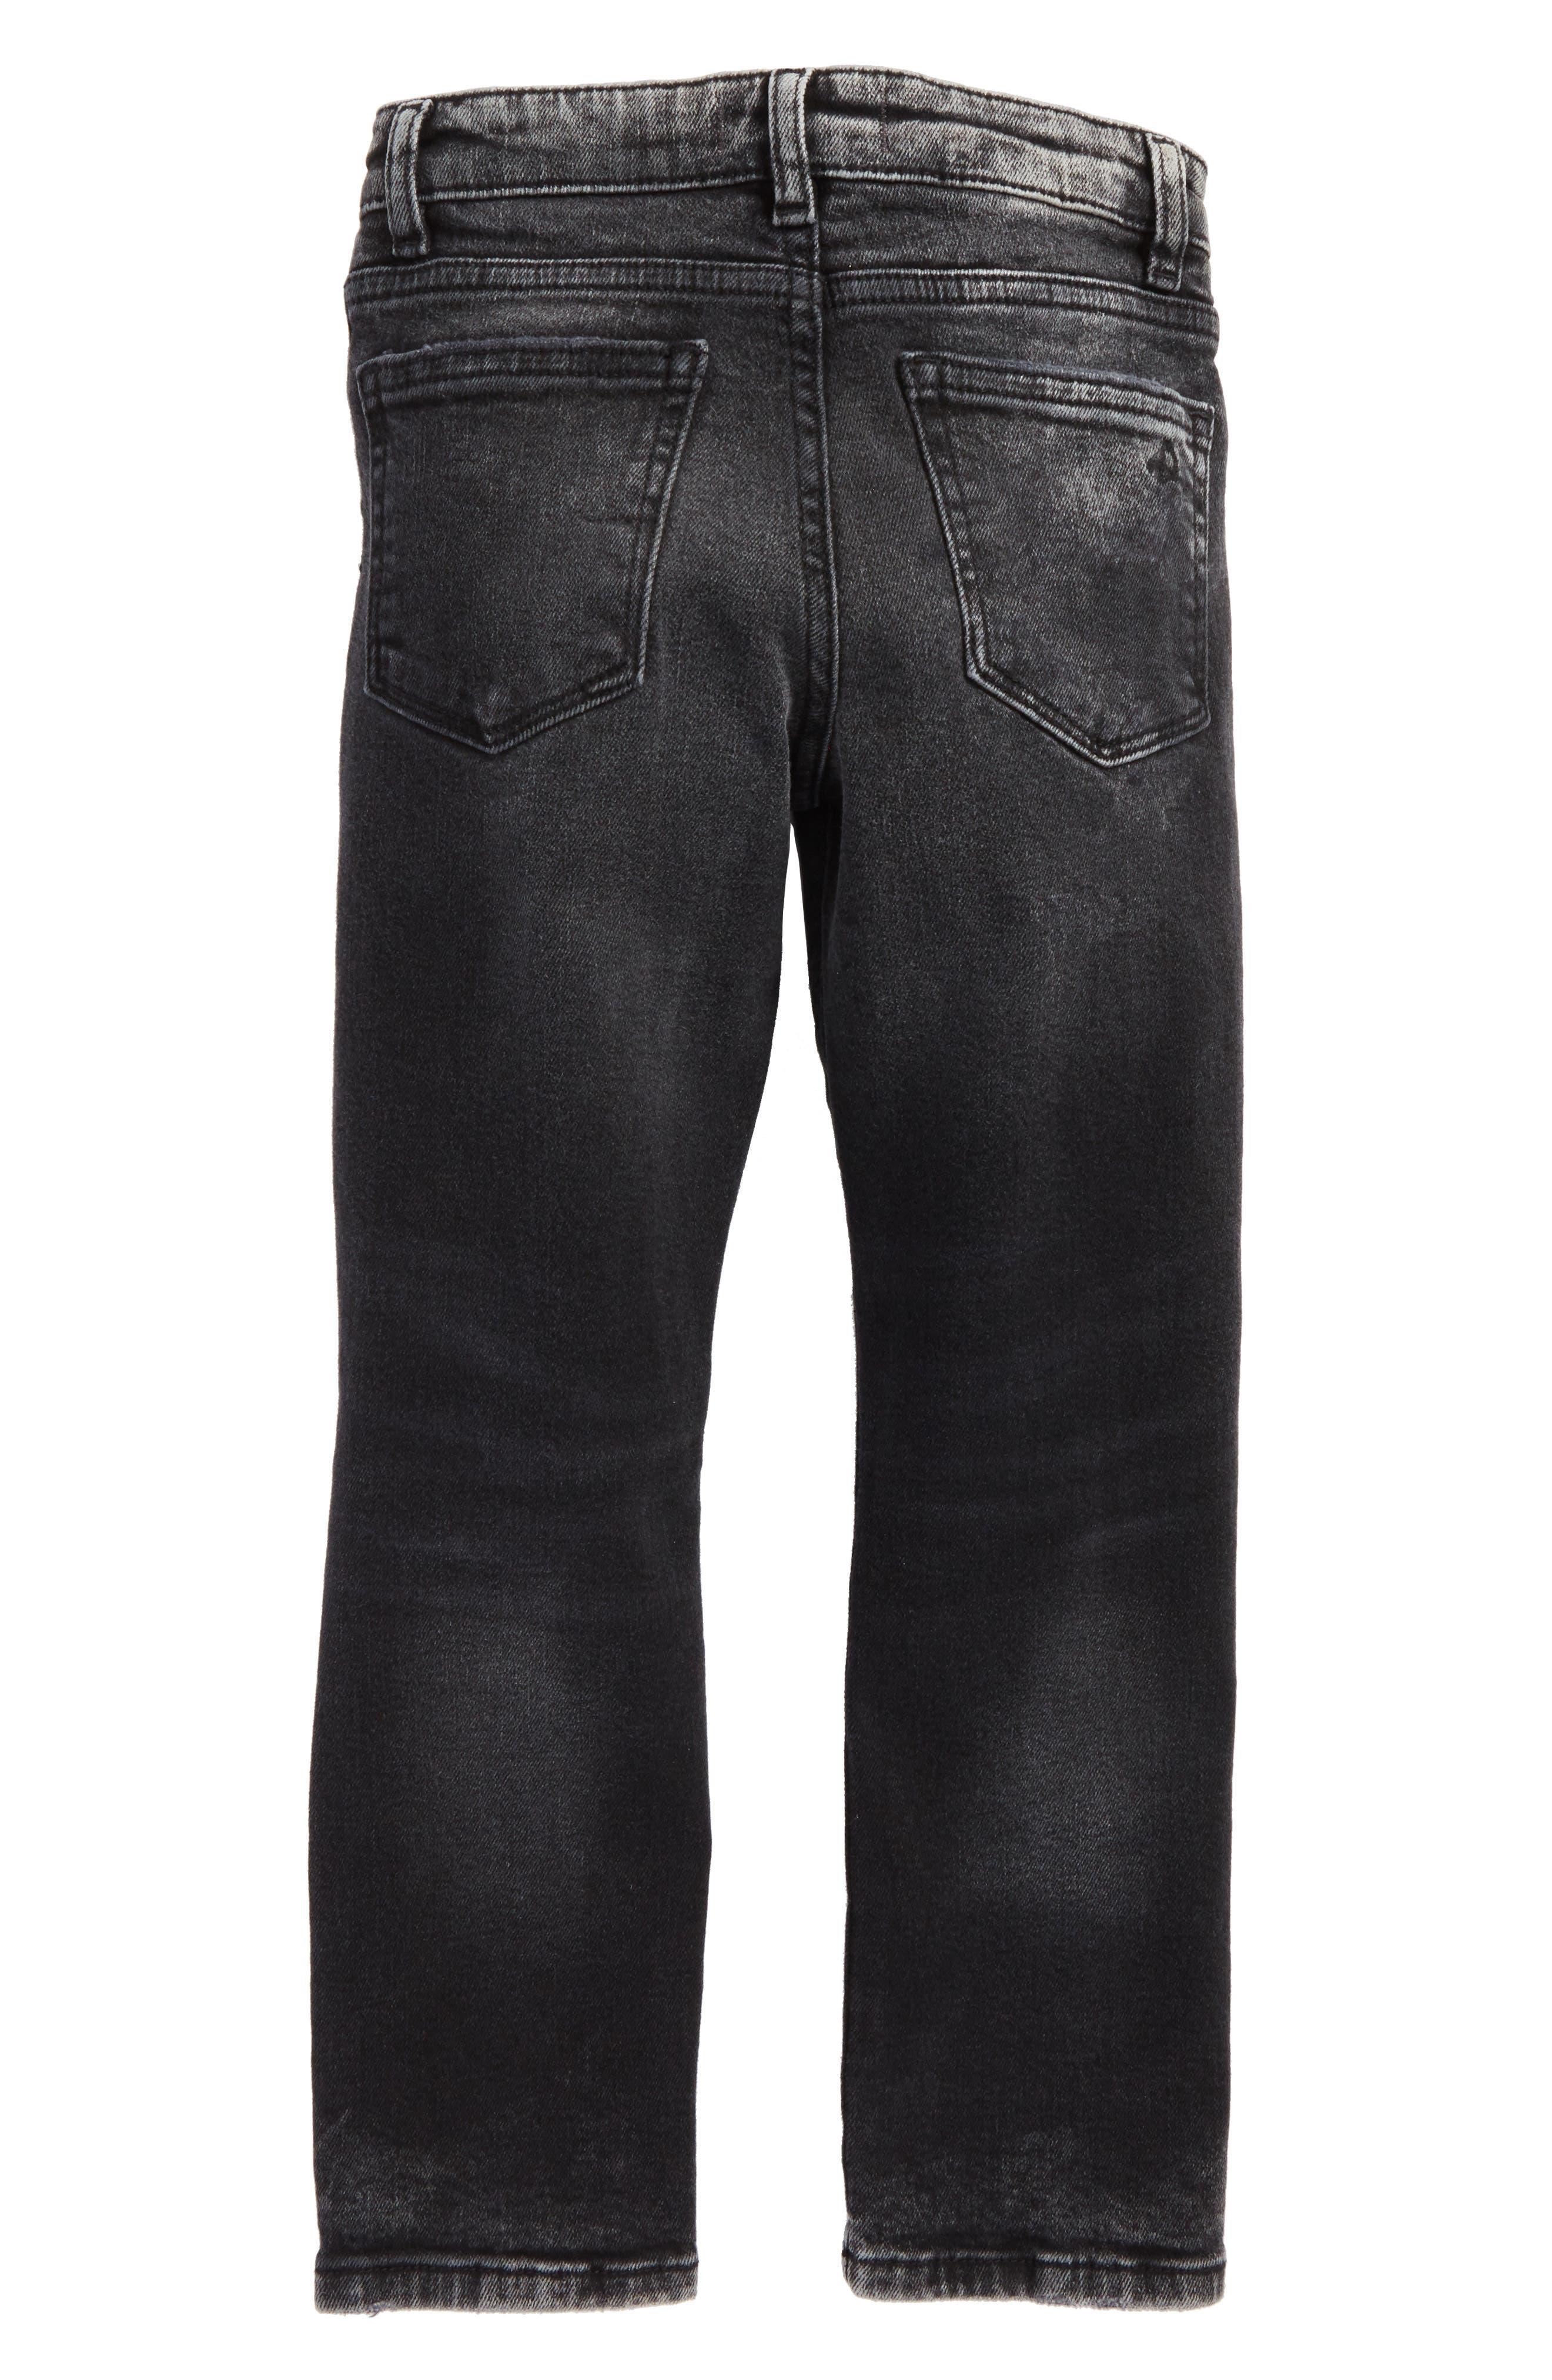 Hawke Skinny Jeans,                             Alternate thumbnail 2, color,                             020